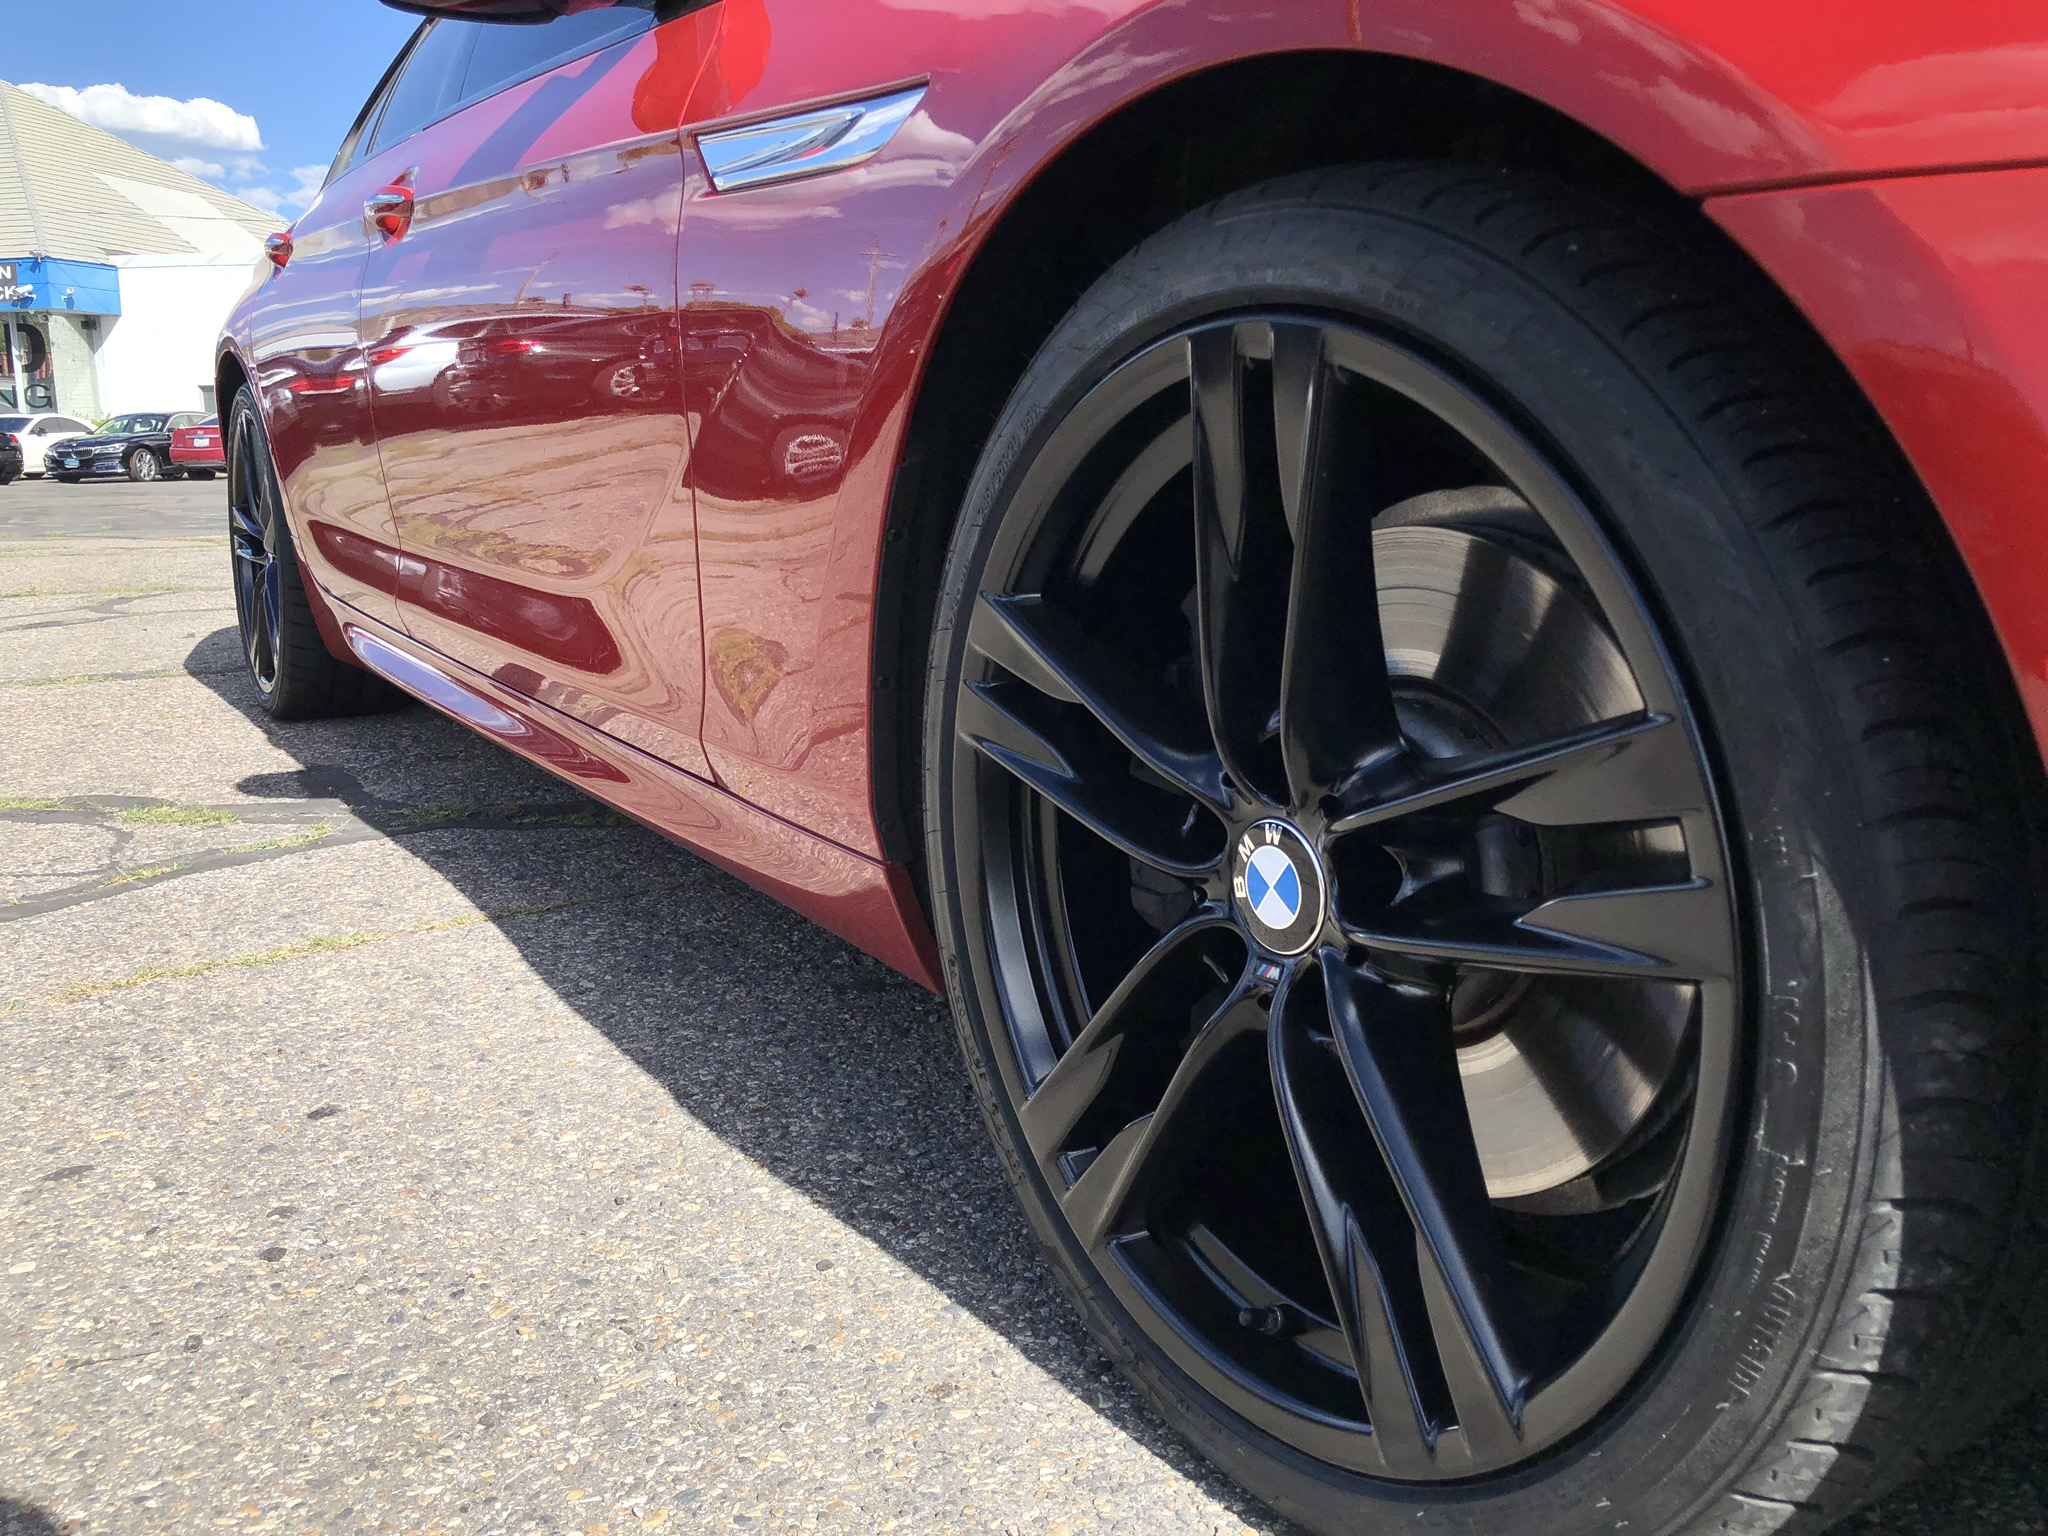 BMW 650i after satin black wheel painting